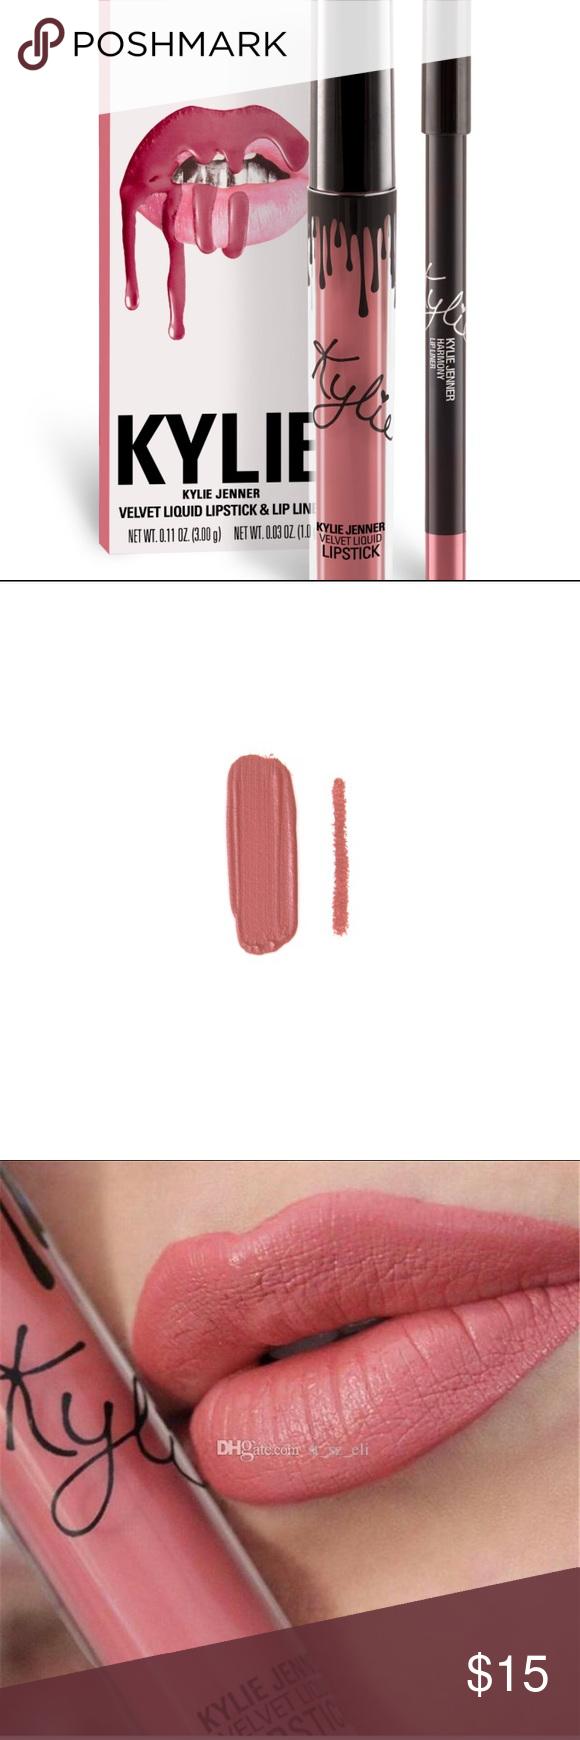 jordan shoes logo pink png lips purple with rash 825263